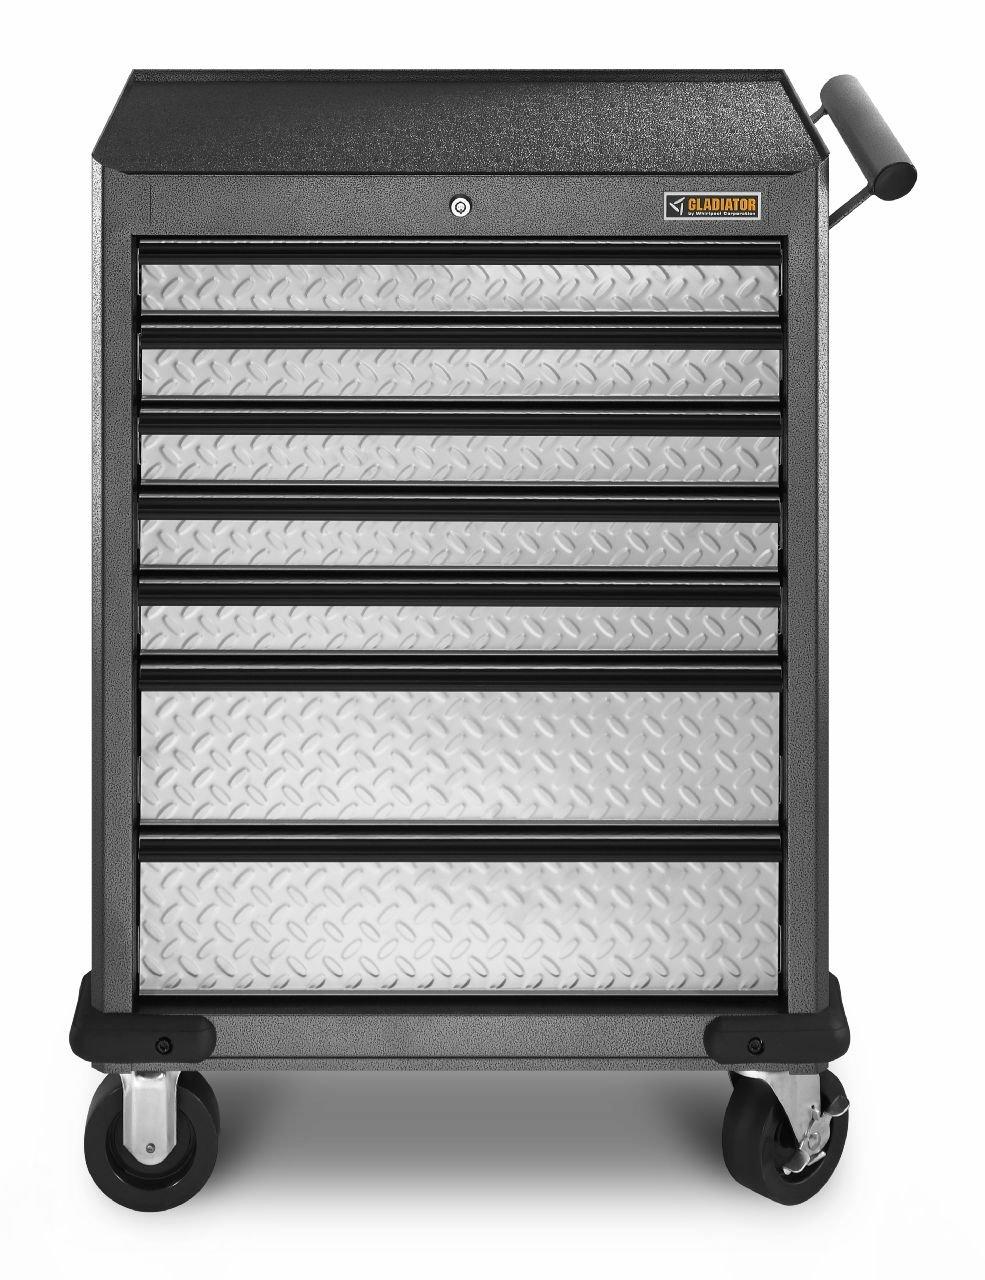 Amazon.com: Gladiator GarageWorks GATR27P7WG Premier 7-Drawer Roll ...